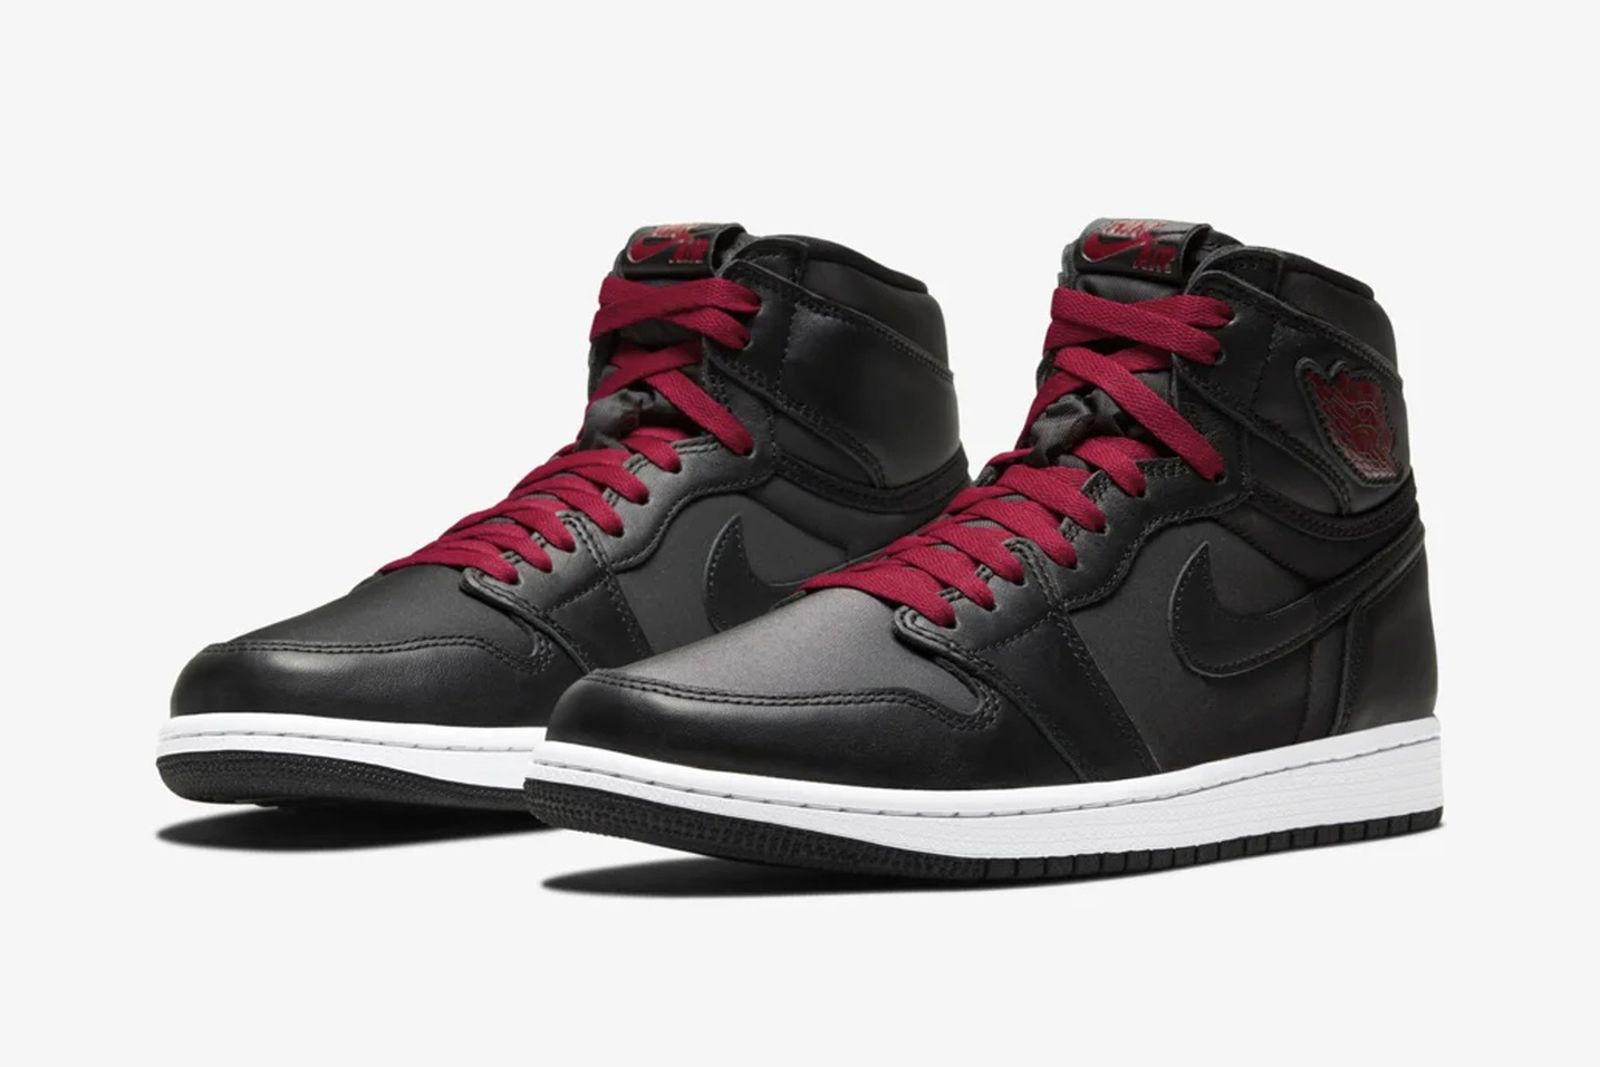 nike-air-jordan-1-neoprene-black-red-release-date-price-02